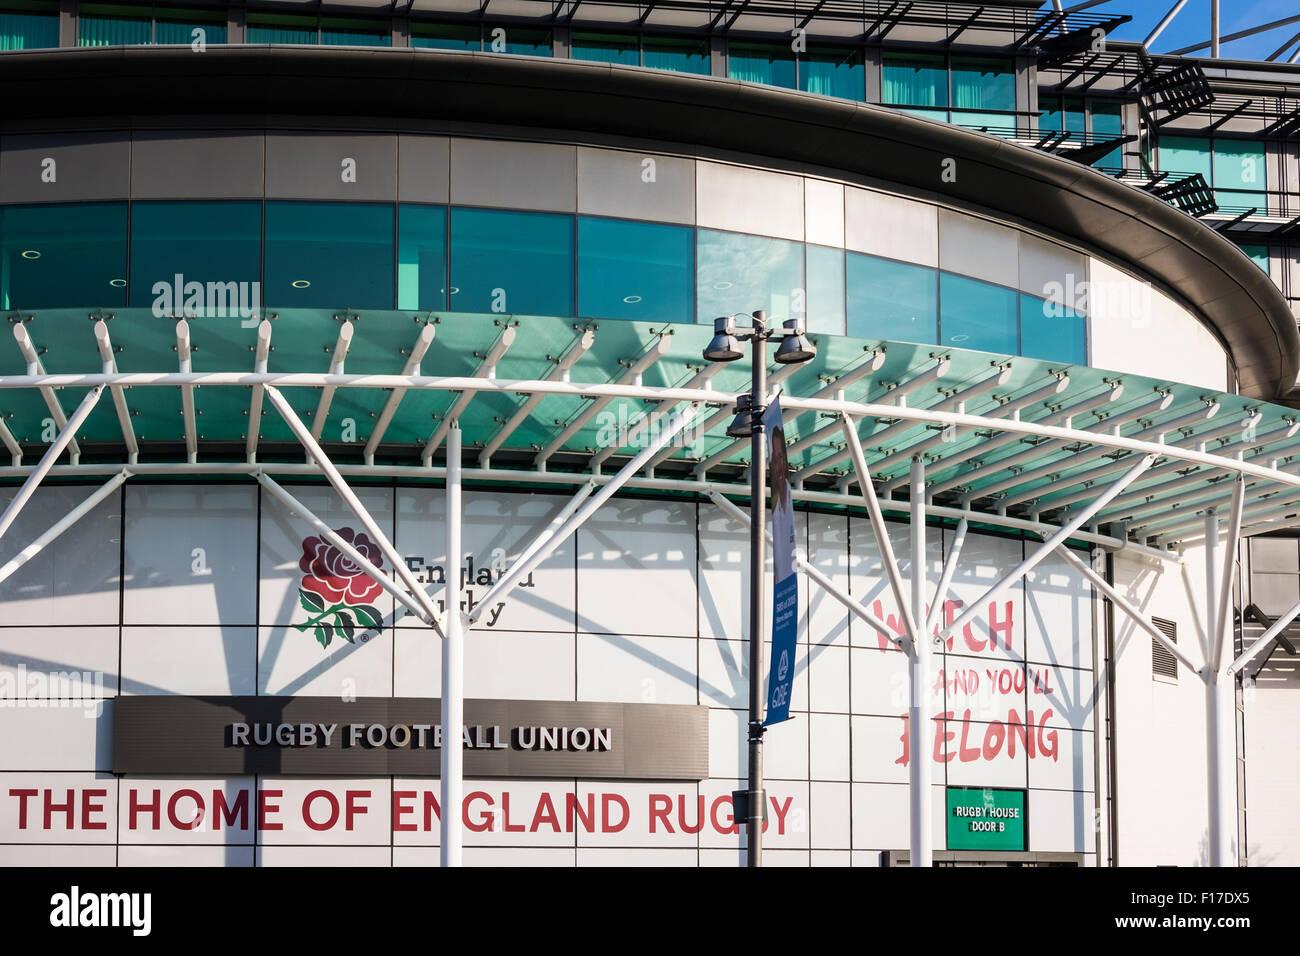 Twickenham Rugby Stadium, London, England, U.K. - Stock Image